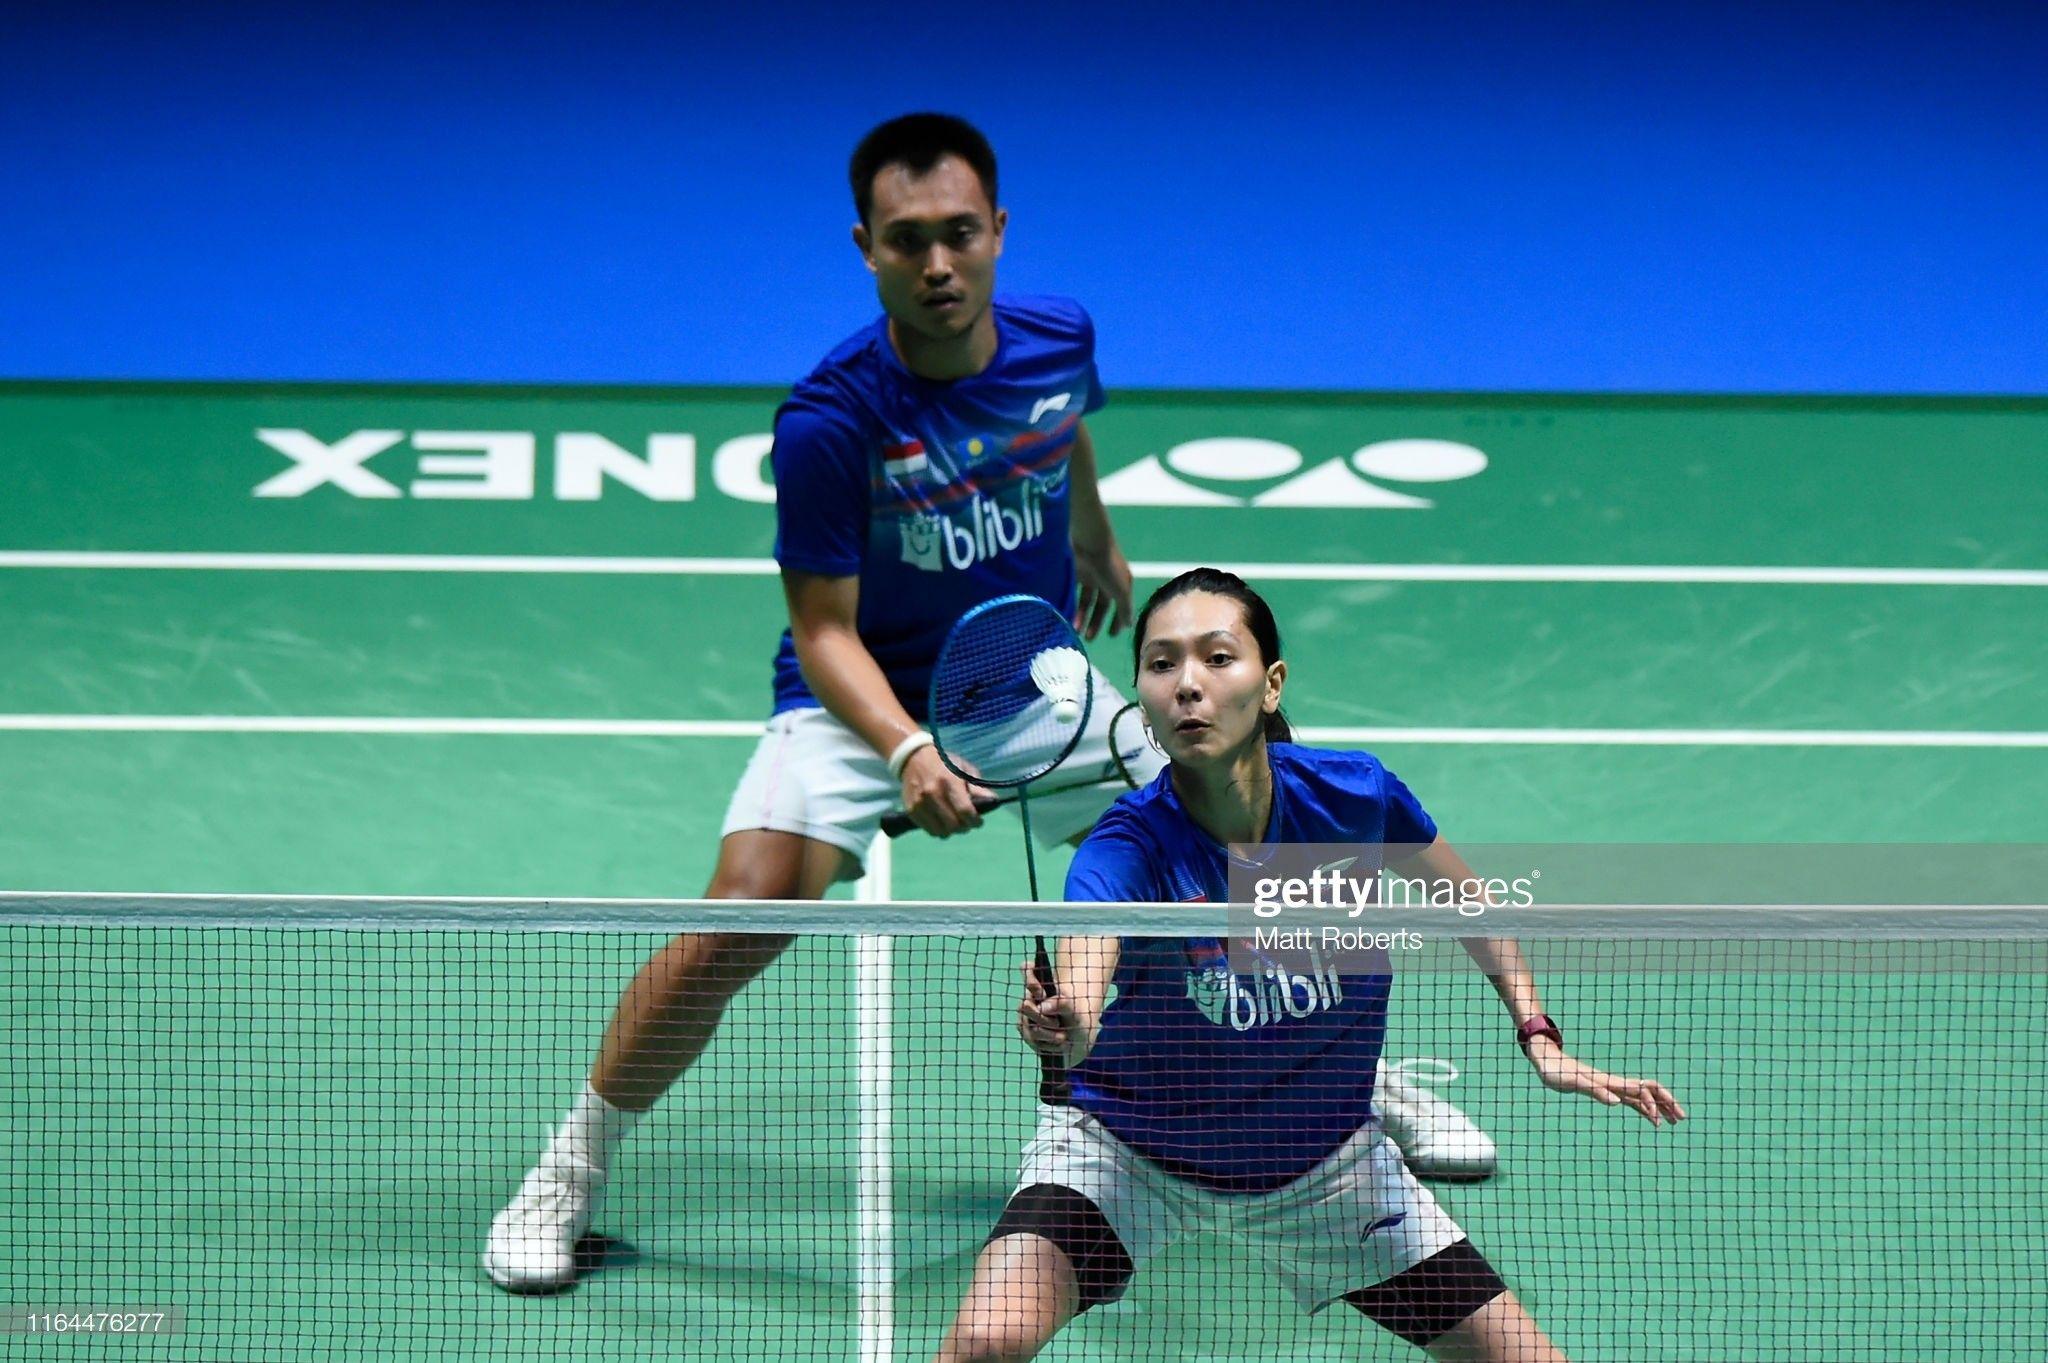 Pin Oleh Badminton Athlete Collection Di Mix Double